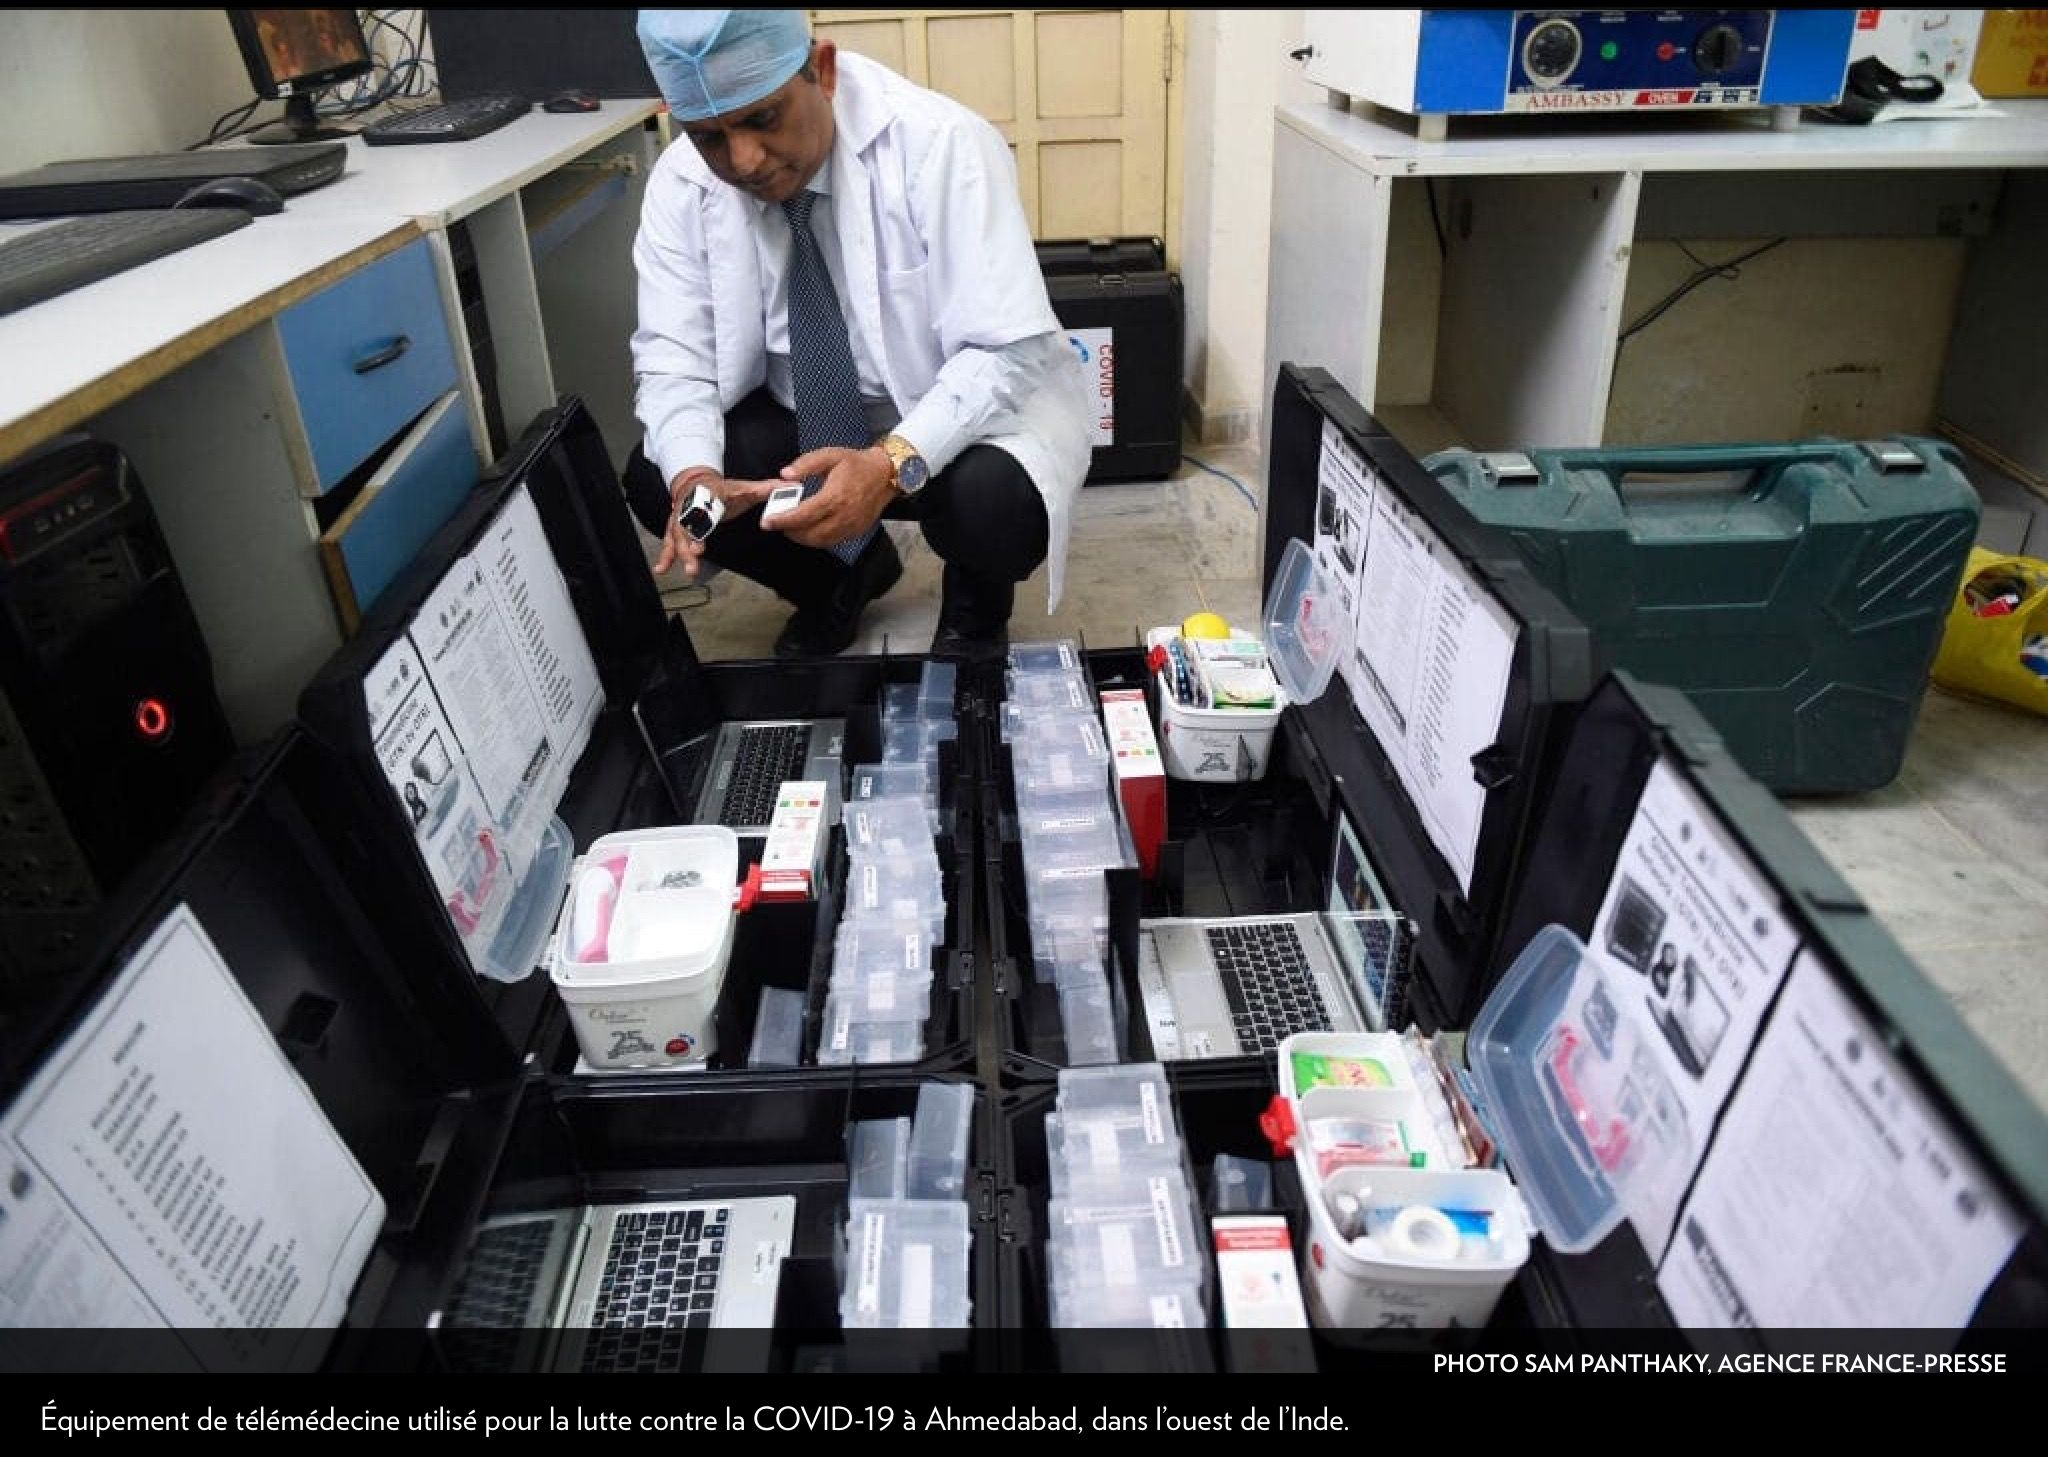 15/03/2020 LaPresse+ in 2020 India, Good laboratory